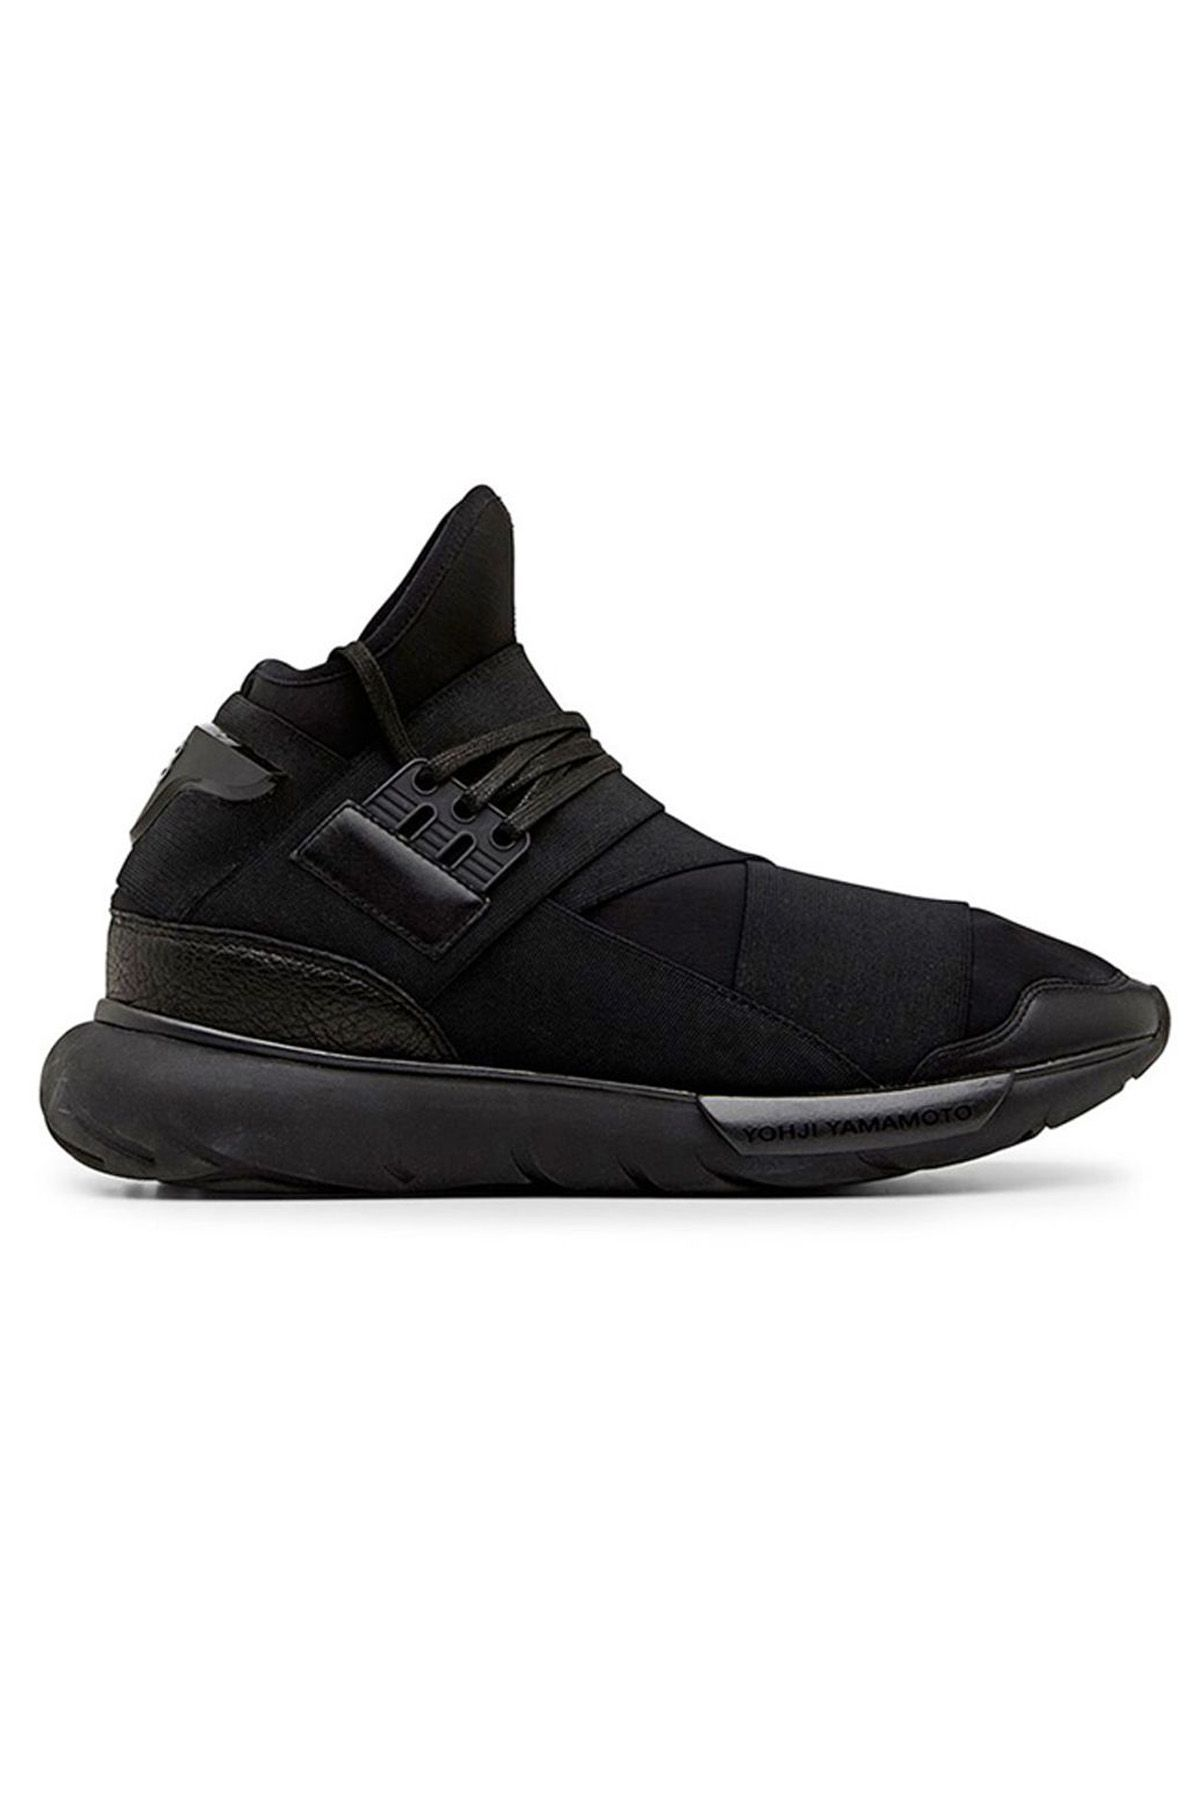 9d454fbb6 Y-3 YOHJI YAMAMOTO QASA HIGH BLACK SNEAKERS Qasa High Black Sneakers ...